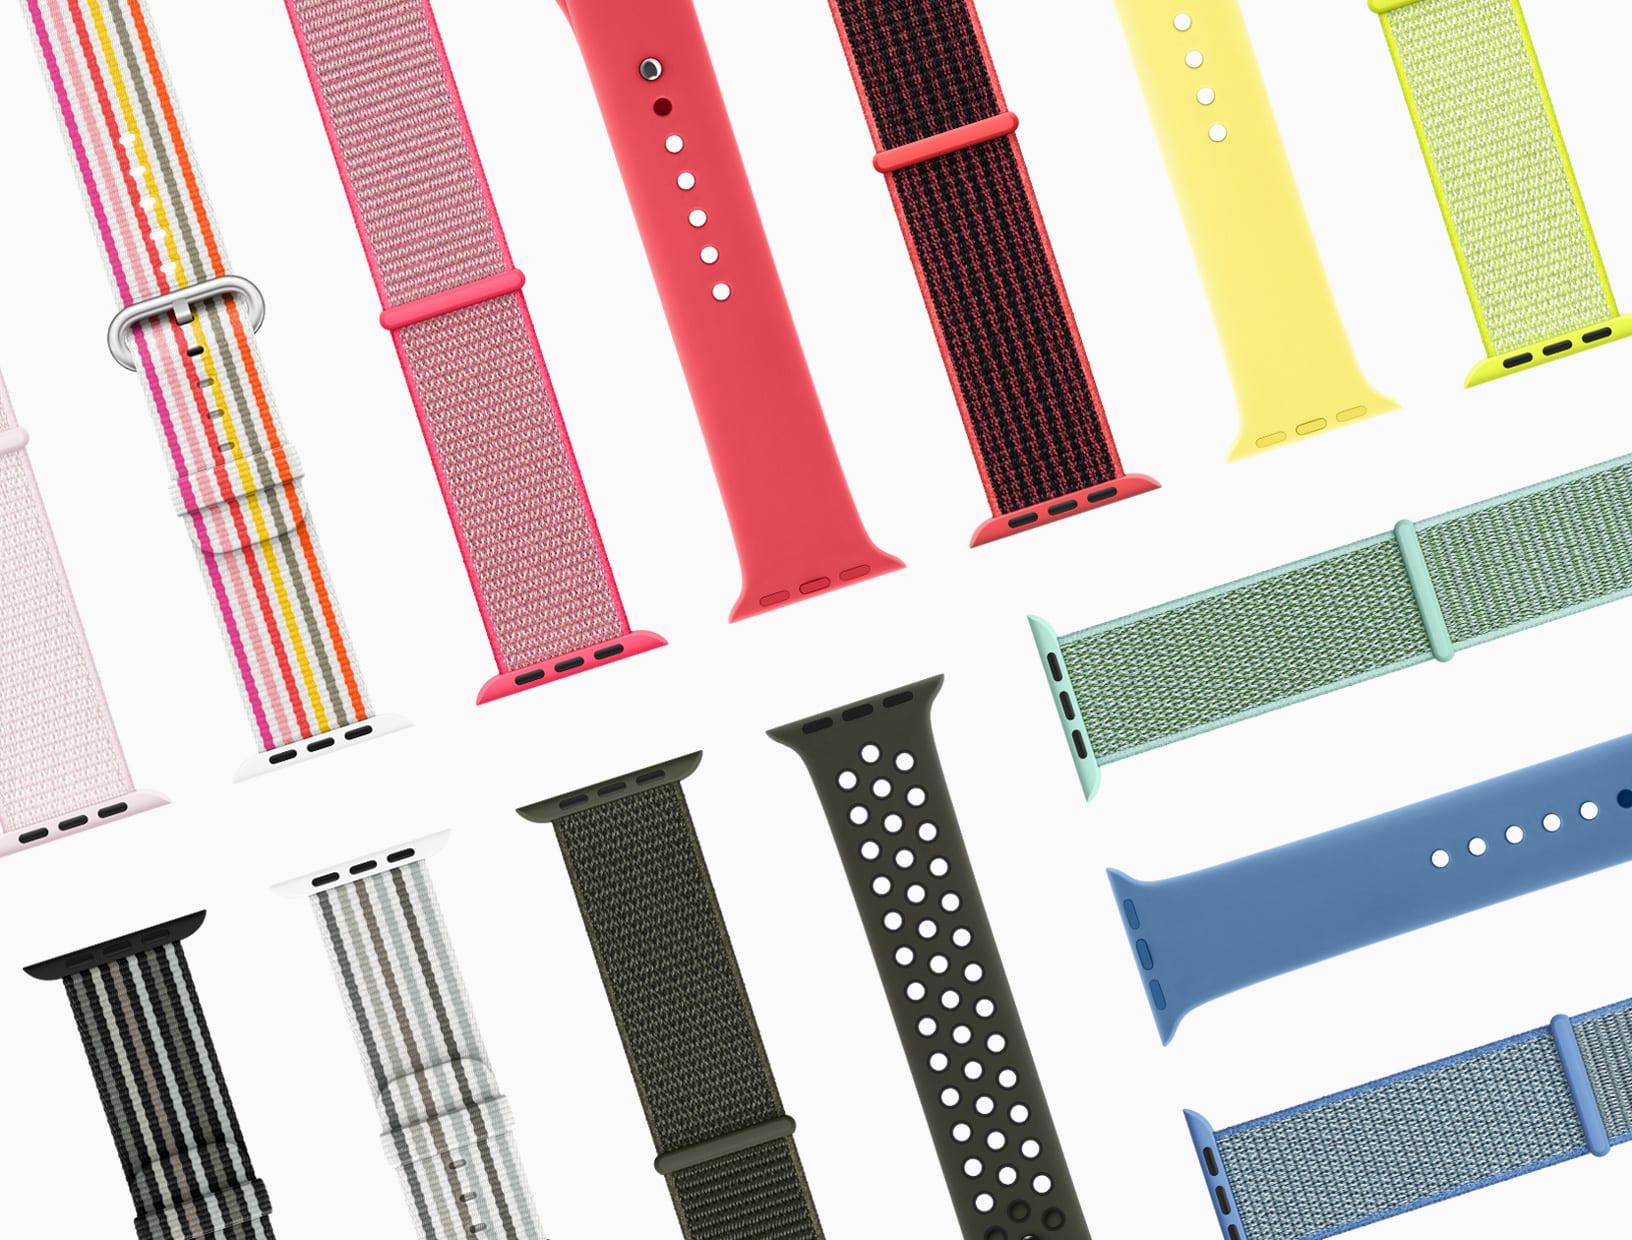 apple watch series3 springbands 032118 - Nový iPad mini nebude, Apple Watch 4 si zachovajú kompatibilitu s remienkami